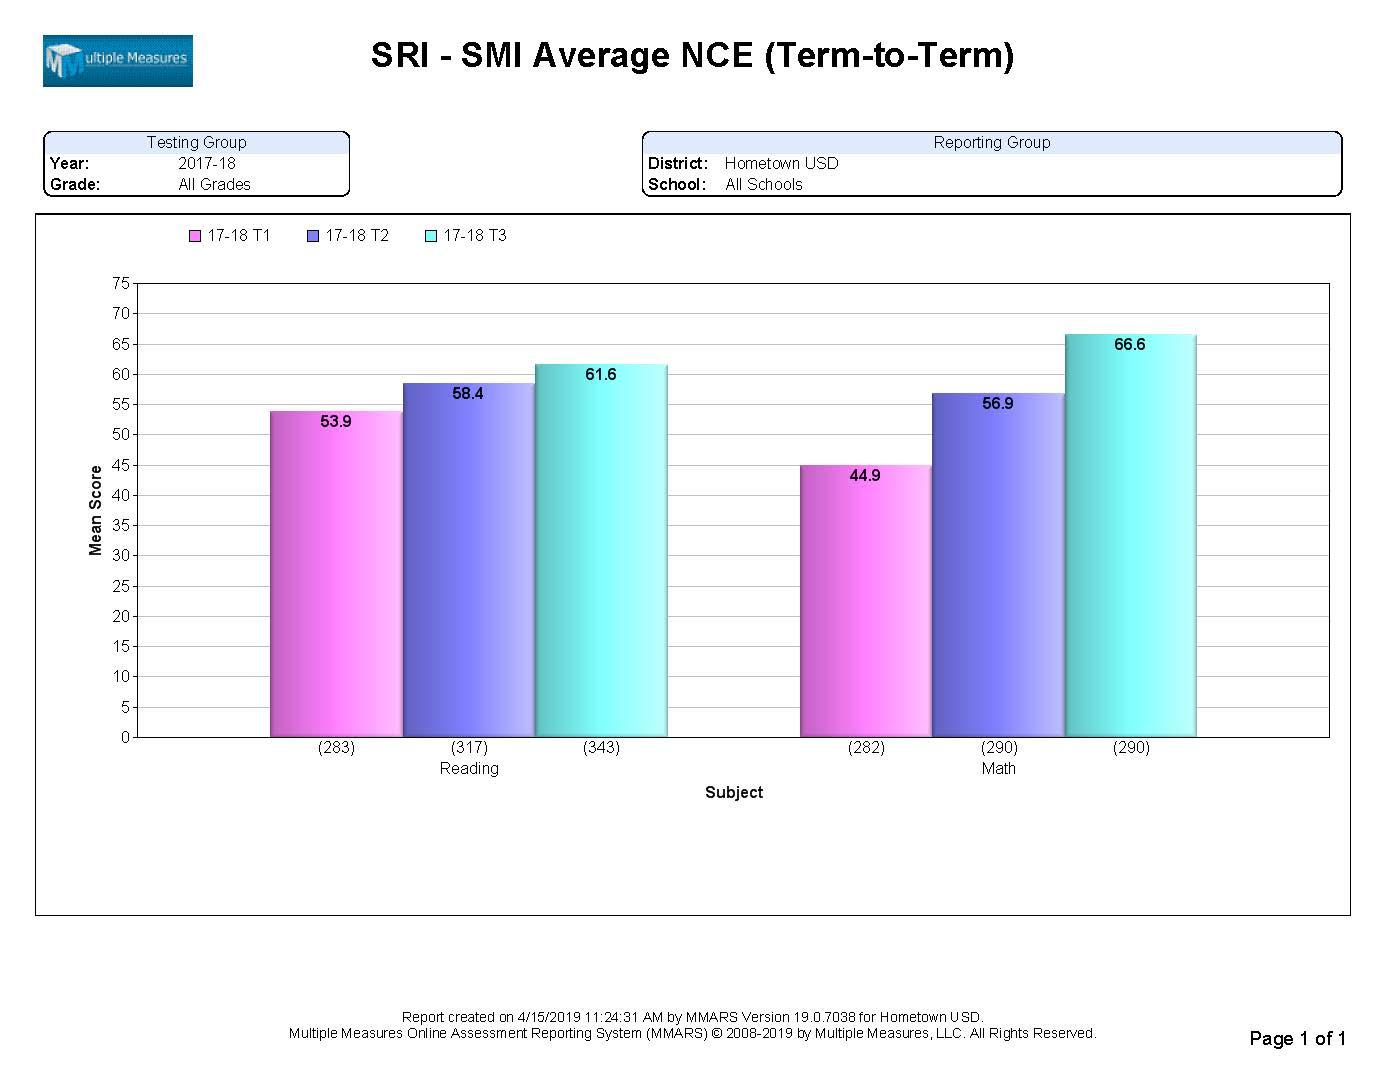 SRI-SMI-Summary_AvgNCE_T2T_CATALOG.jpg